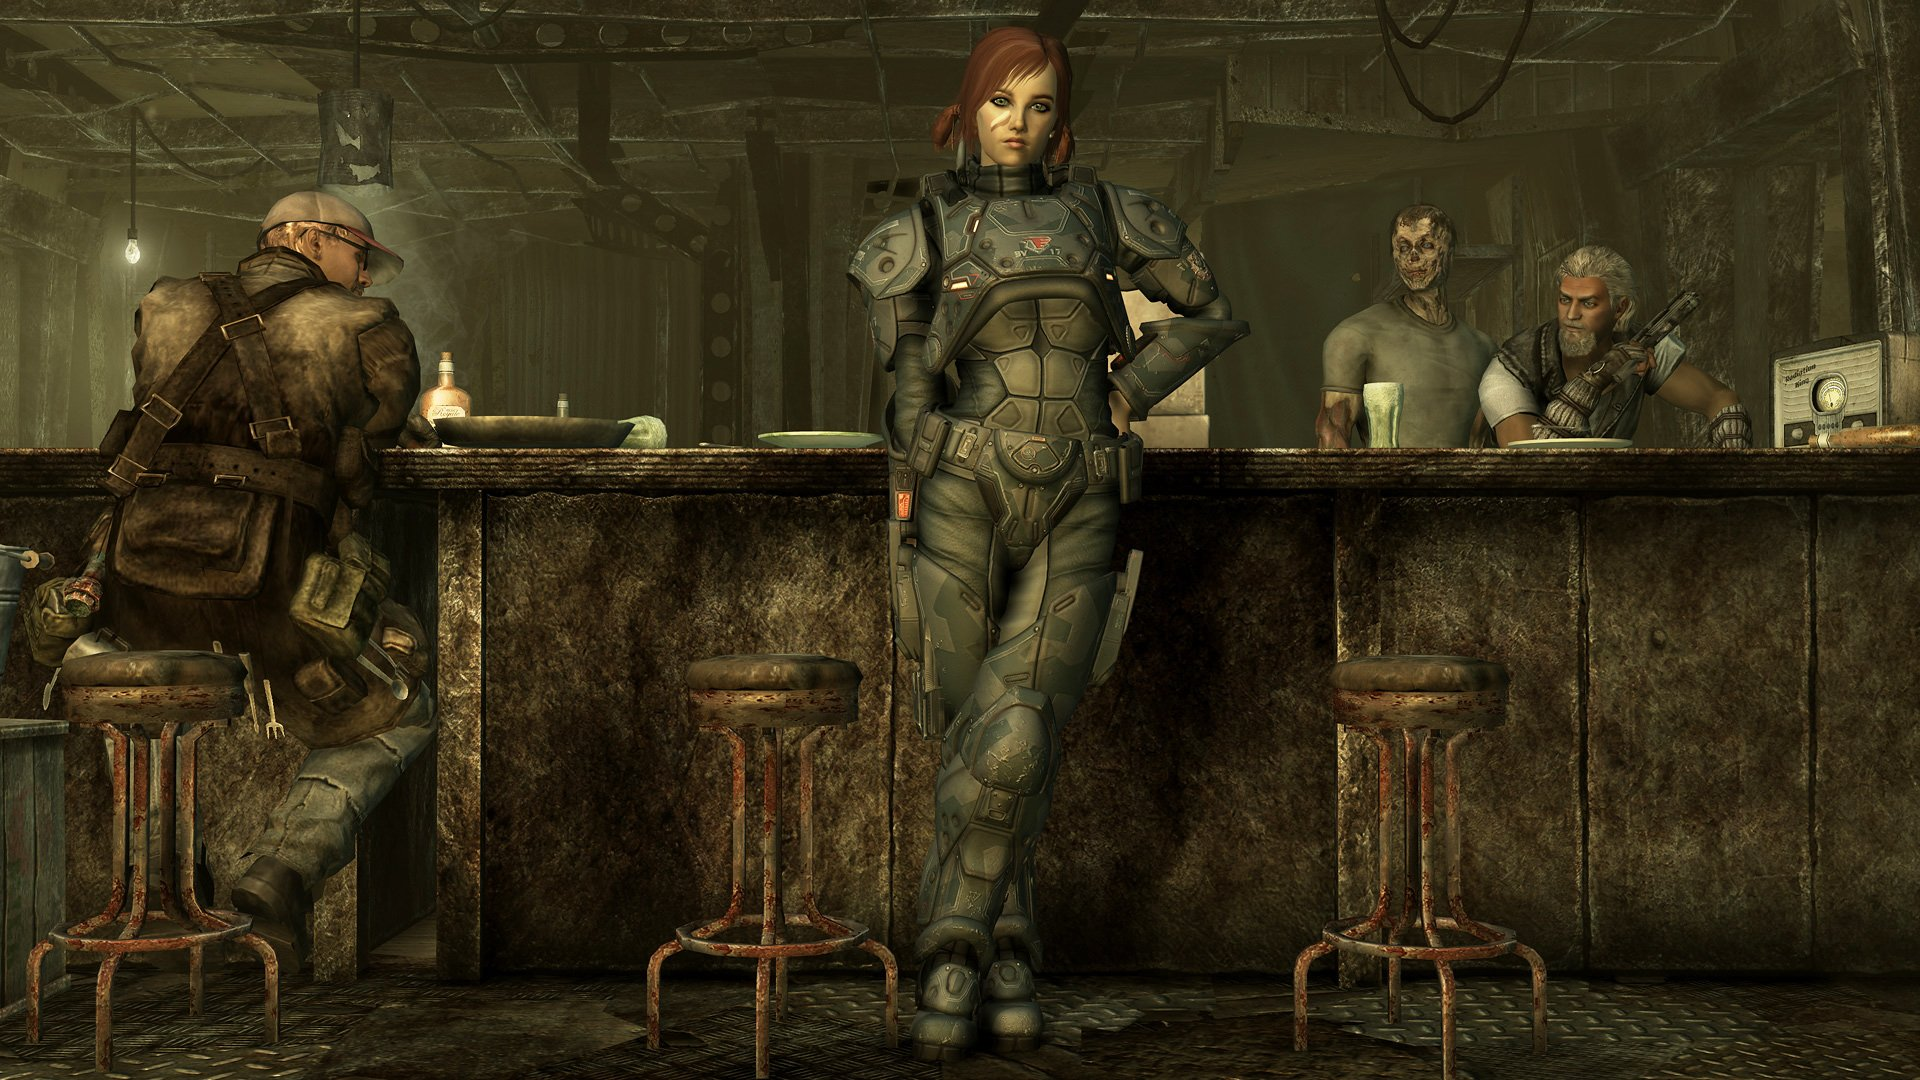 Fallout HD Wallpaper   Background Image   1920x1080   ID ...